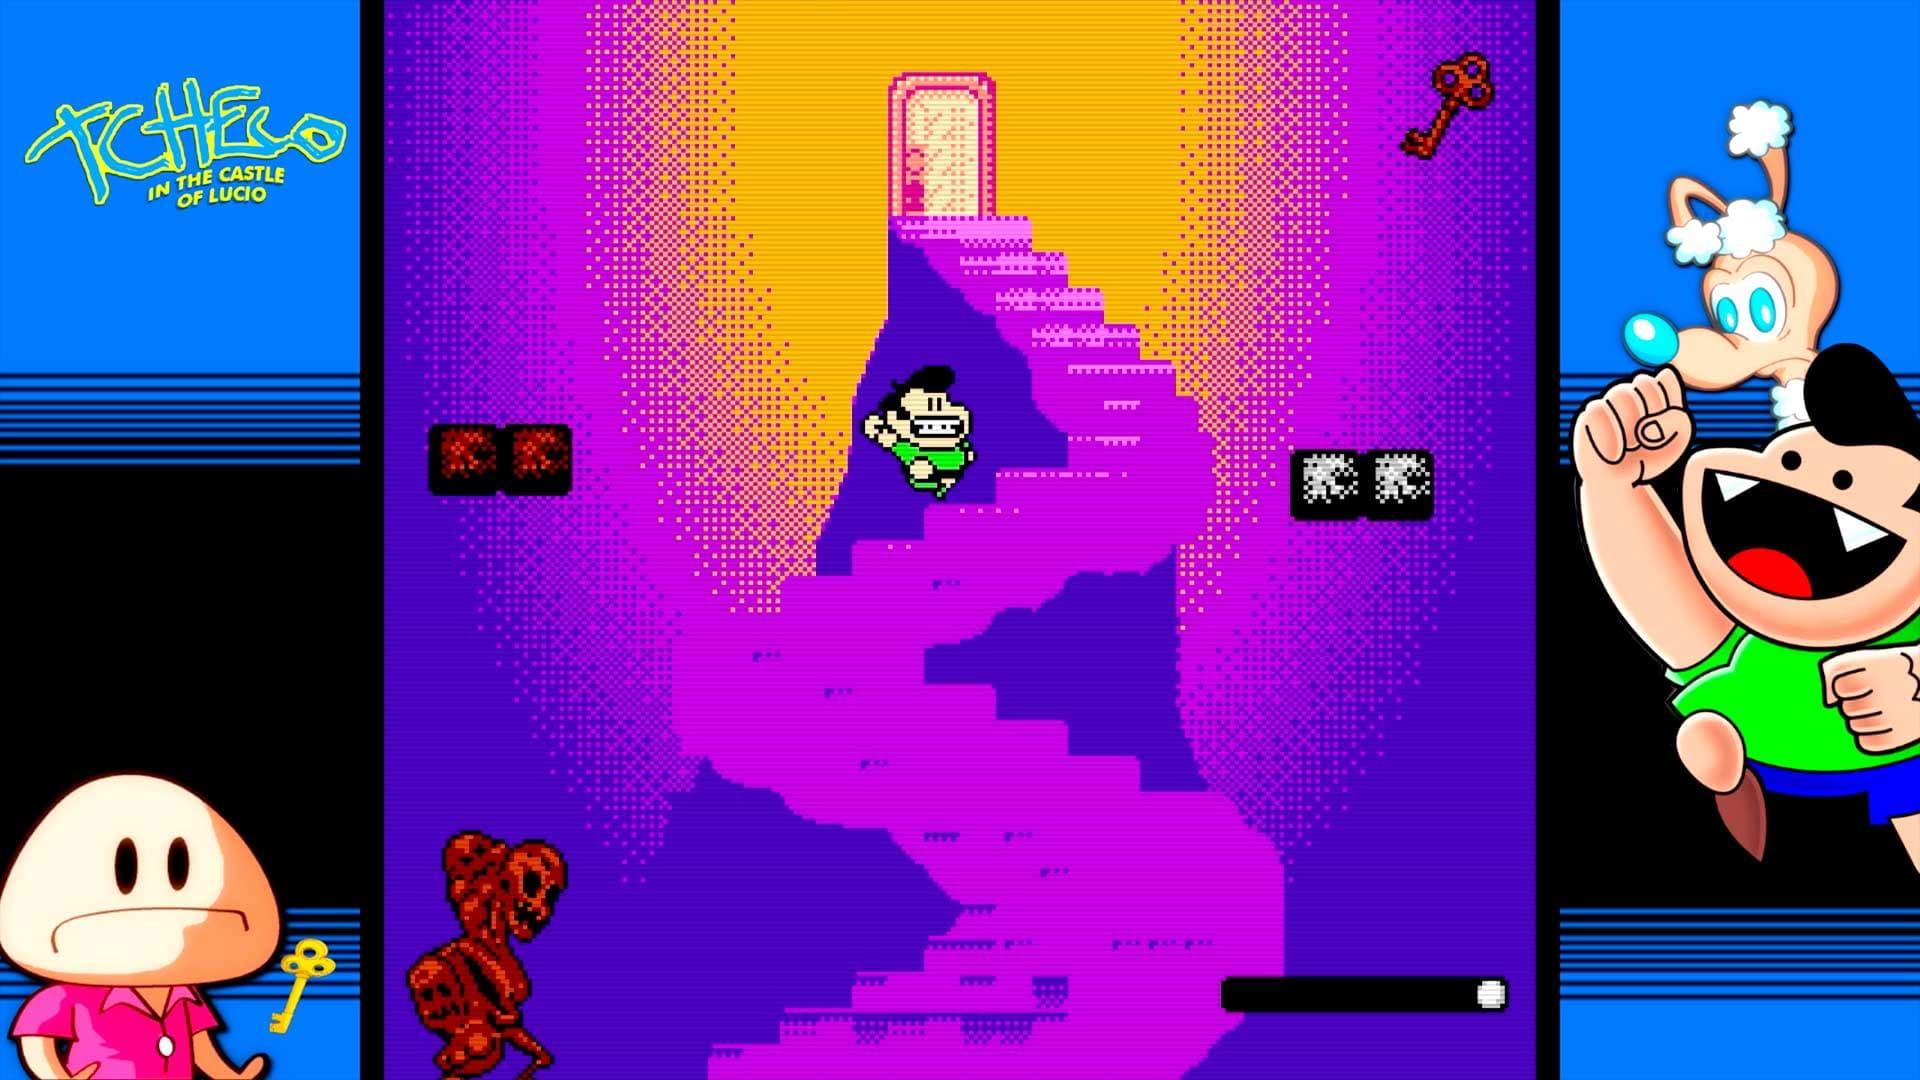 Tcheco in the Castle of Lucio Xbox One